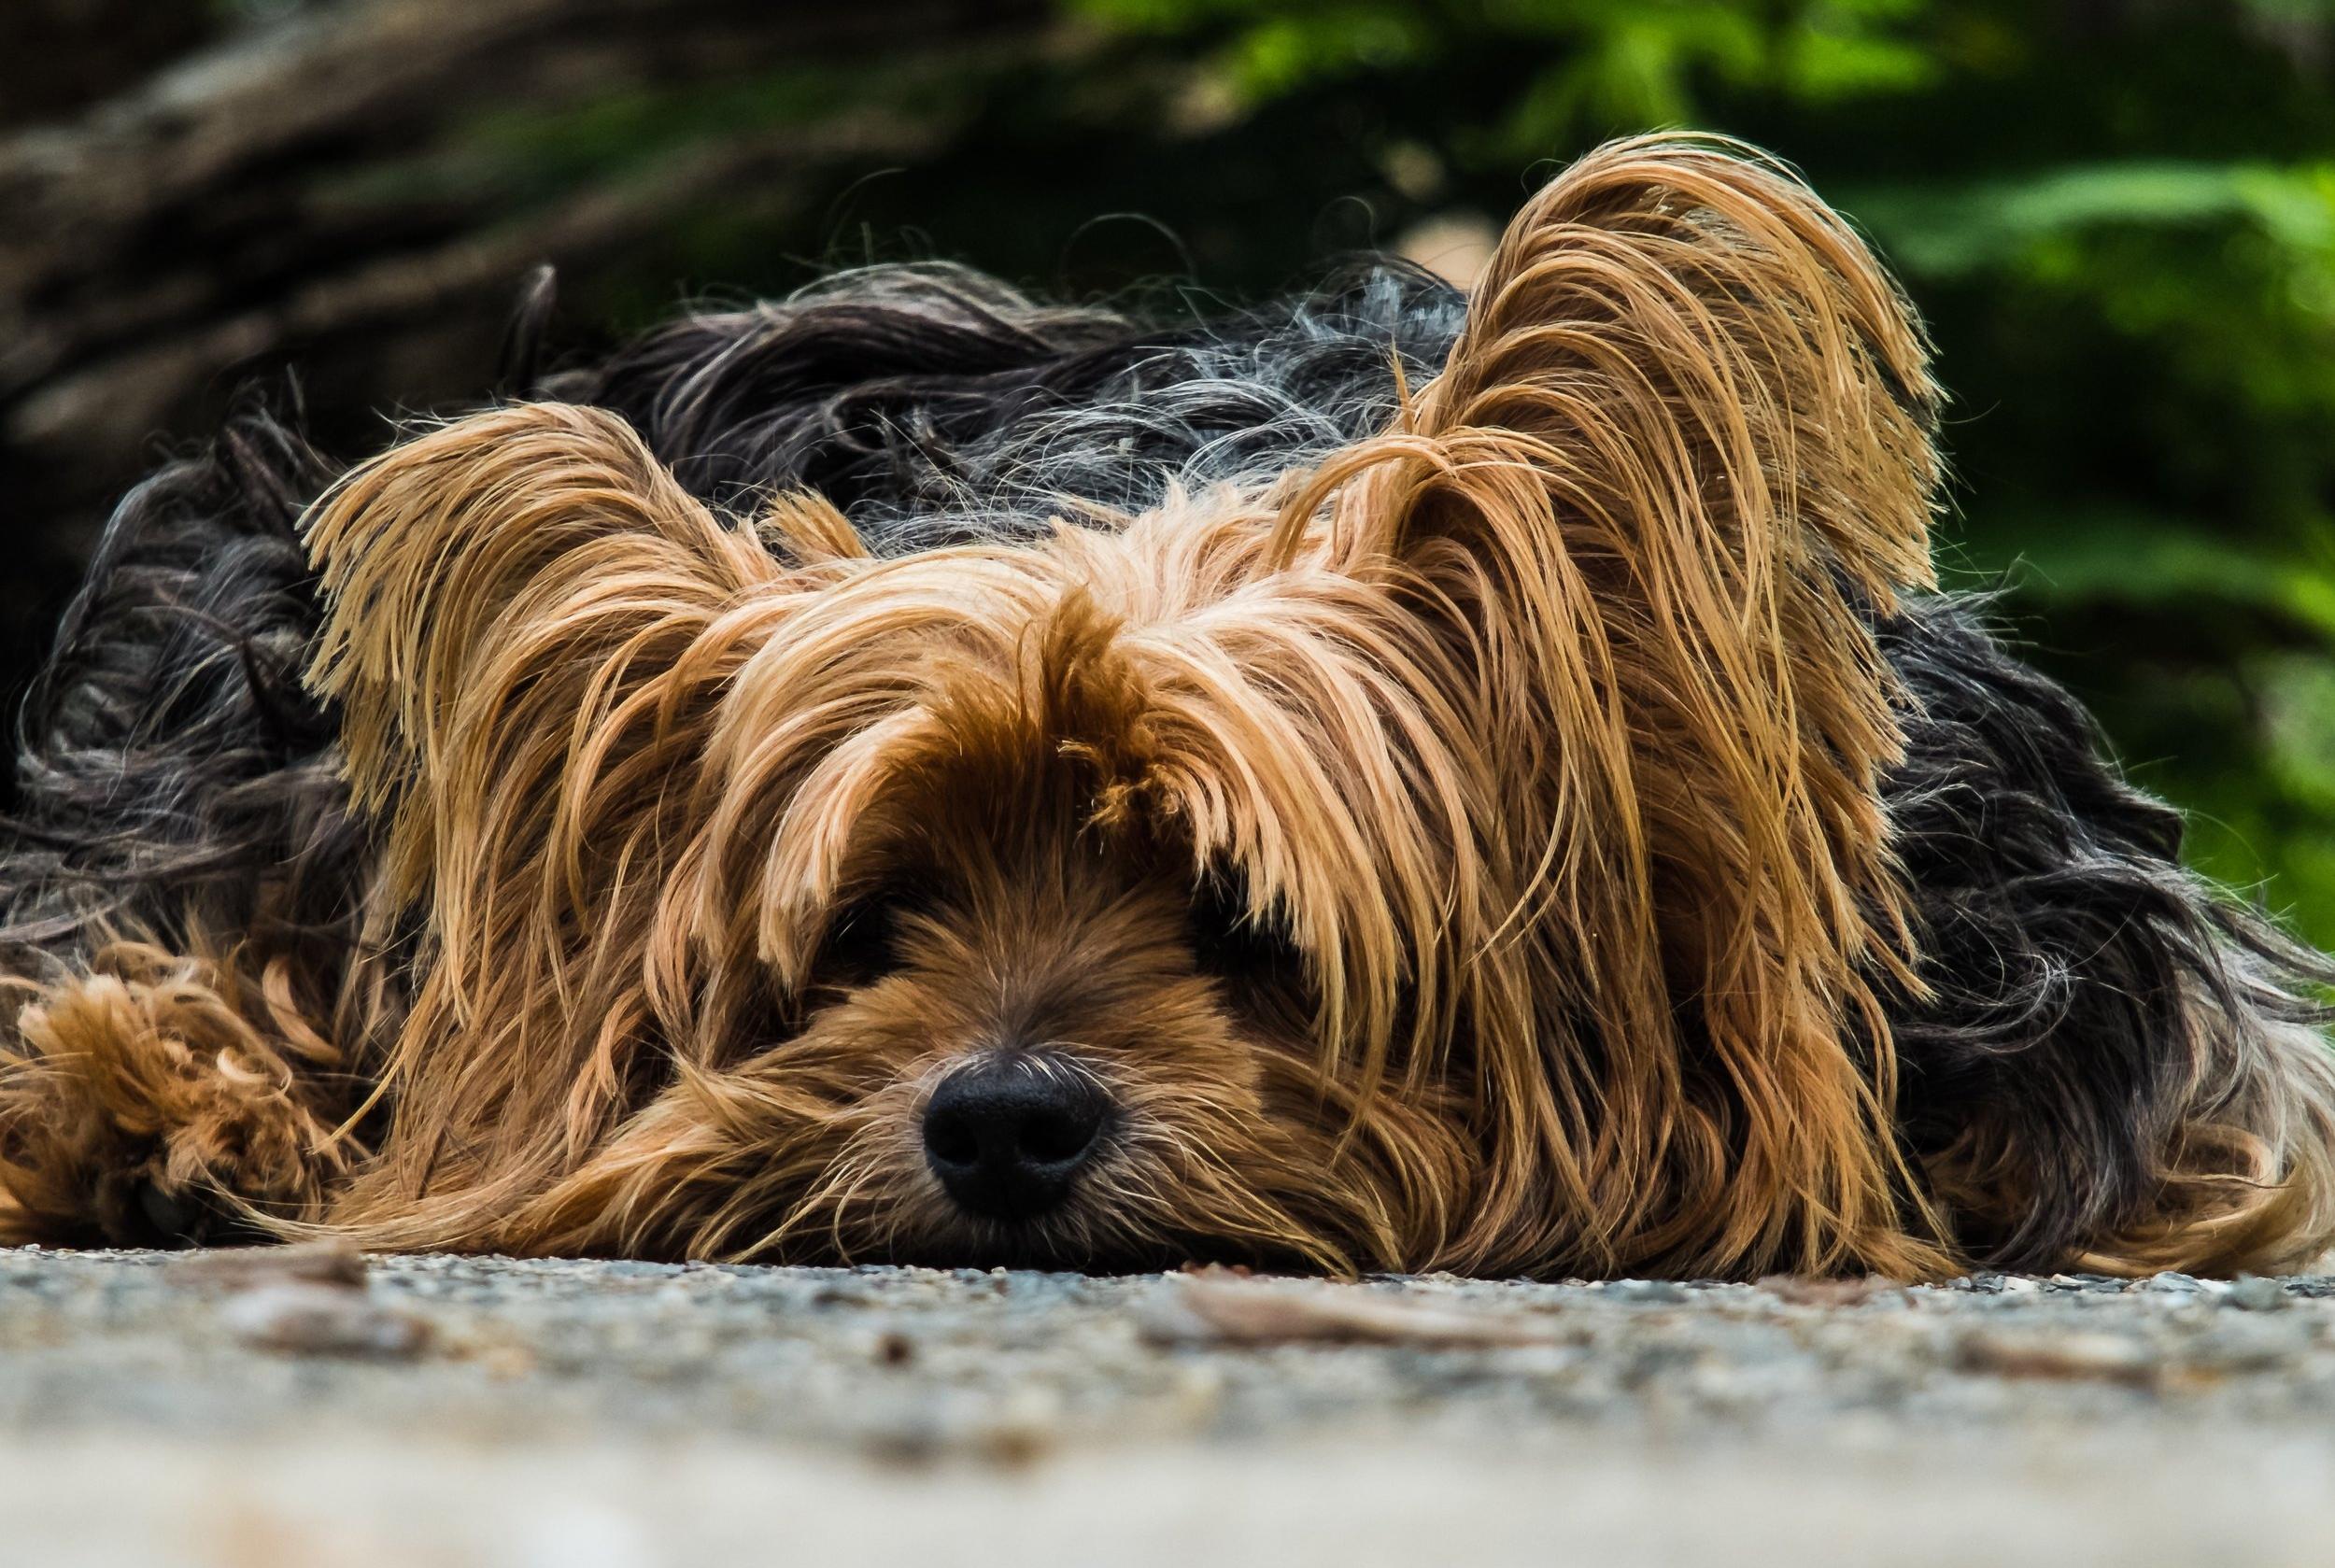 dog-yorkshire-terrier-lazy-dog-65594.jpeg